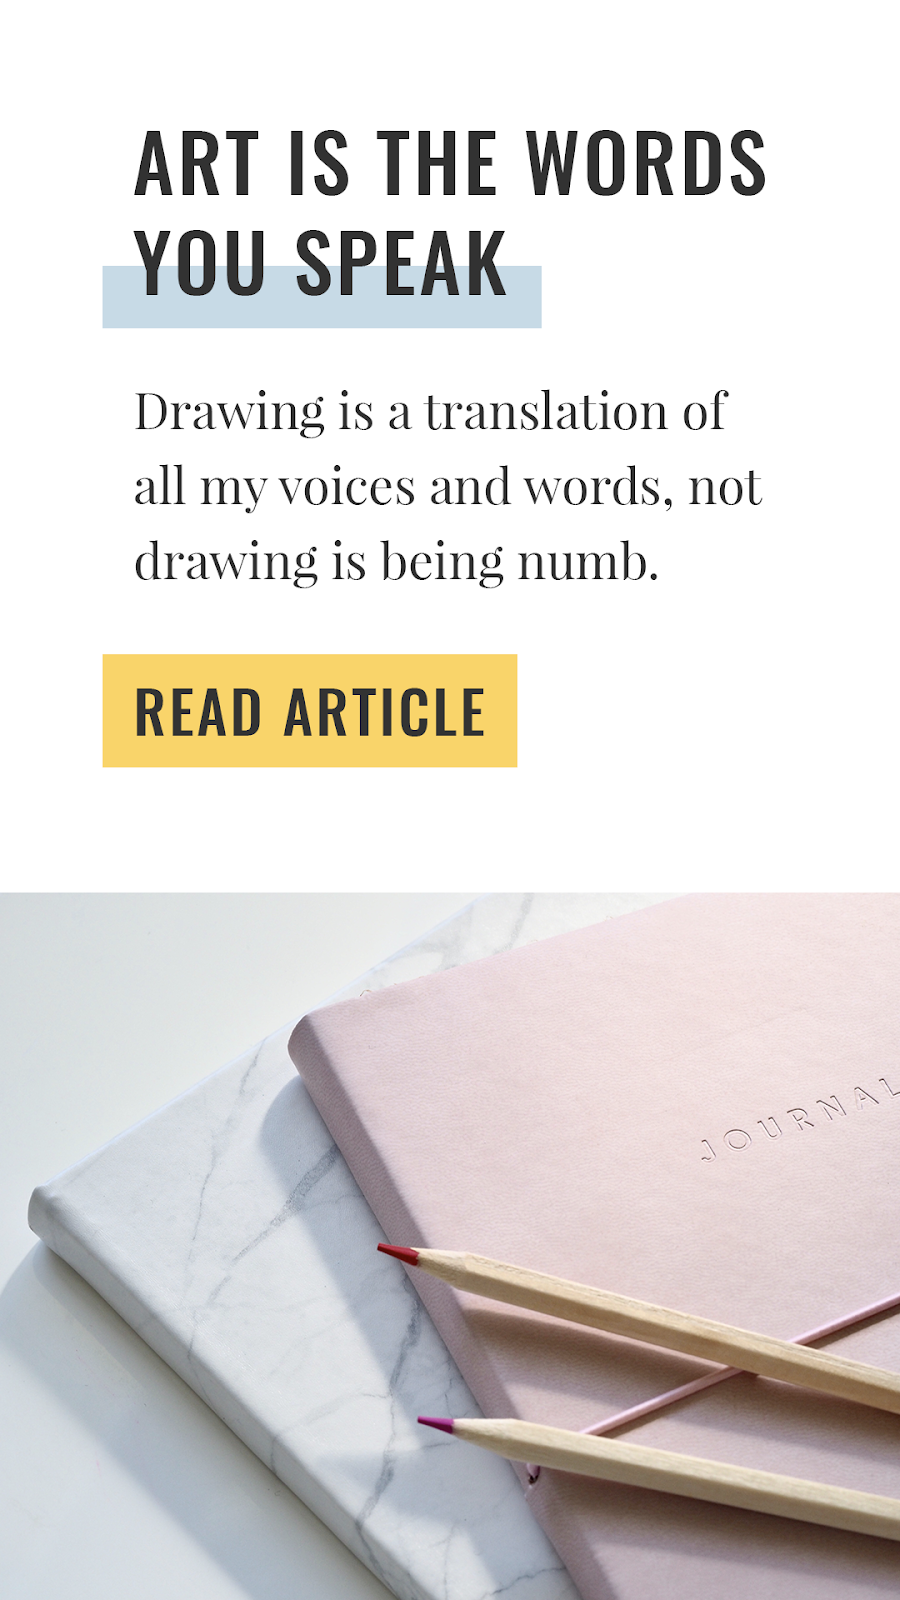 Designest Article Advertisement Instagram Stories Template